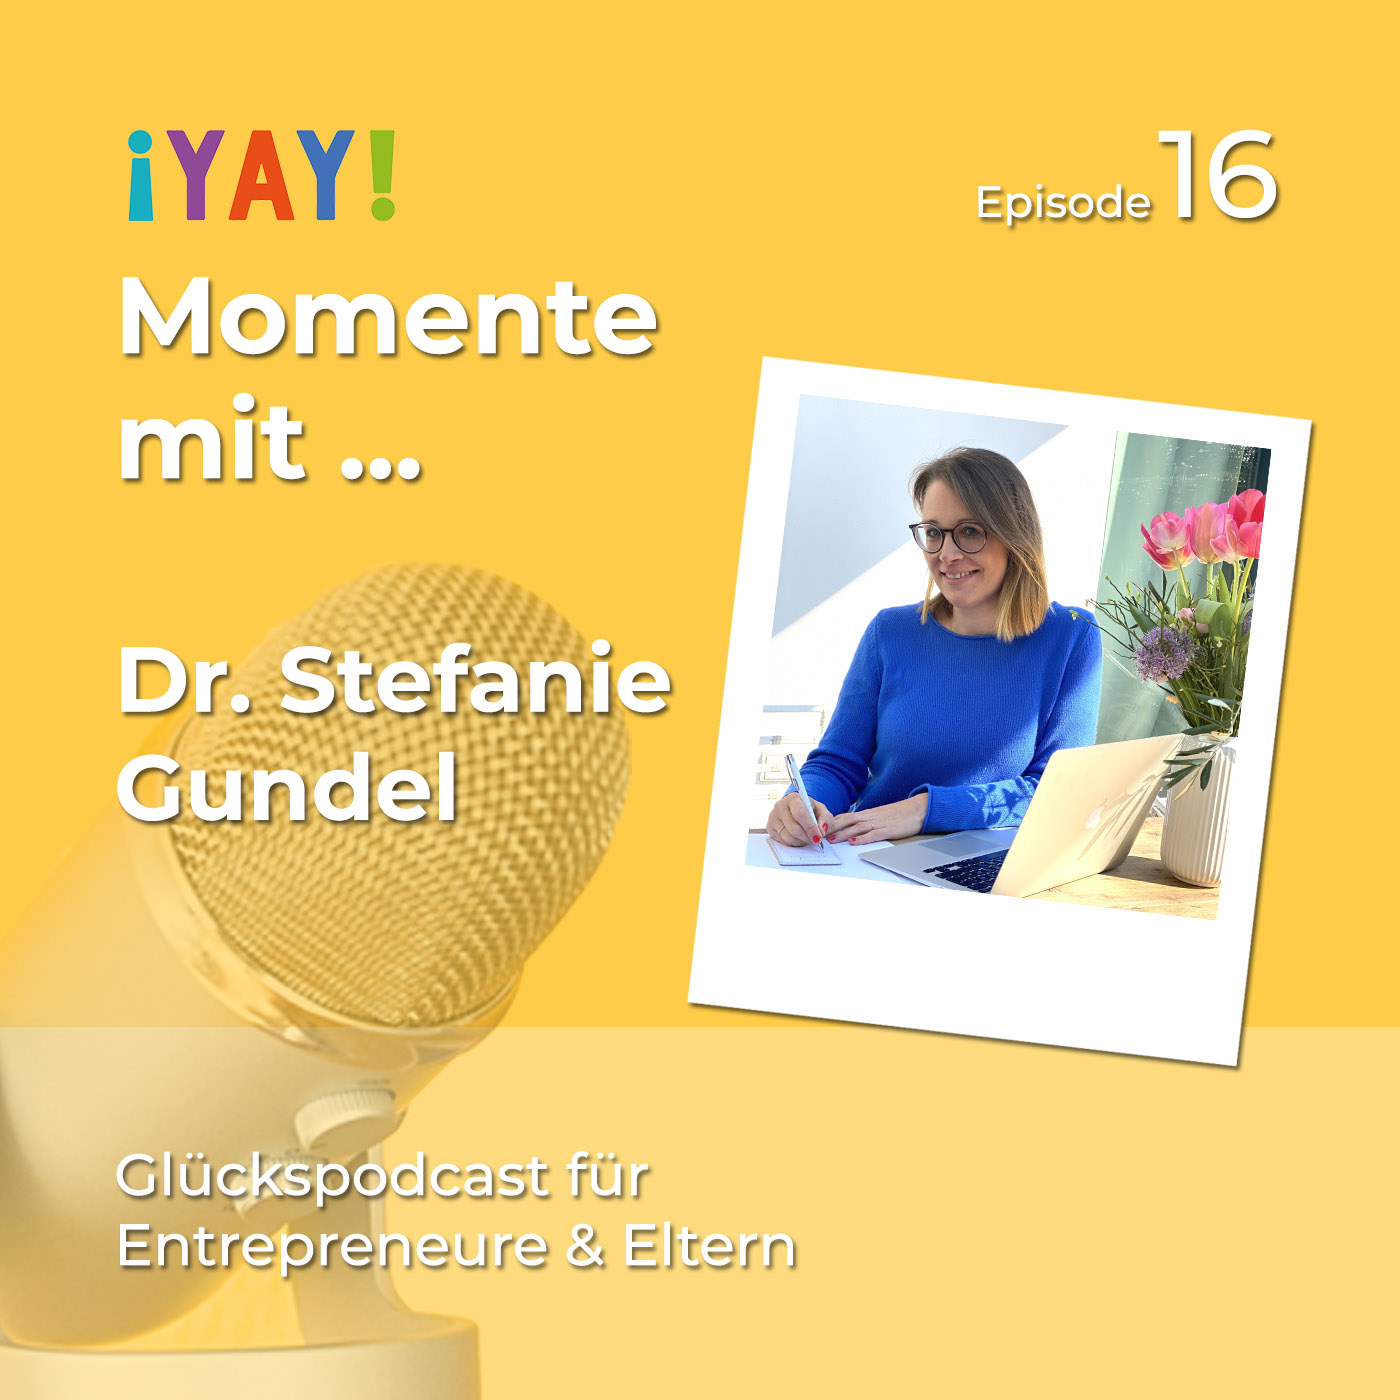 Yay-Momente mit ... Dr. Stefanie Gundel